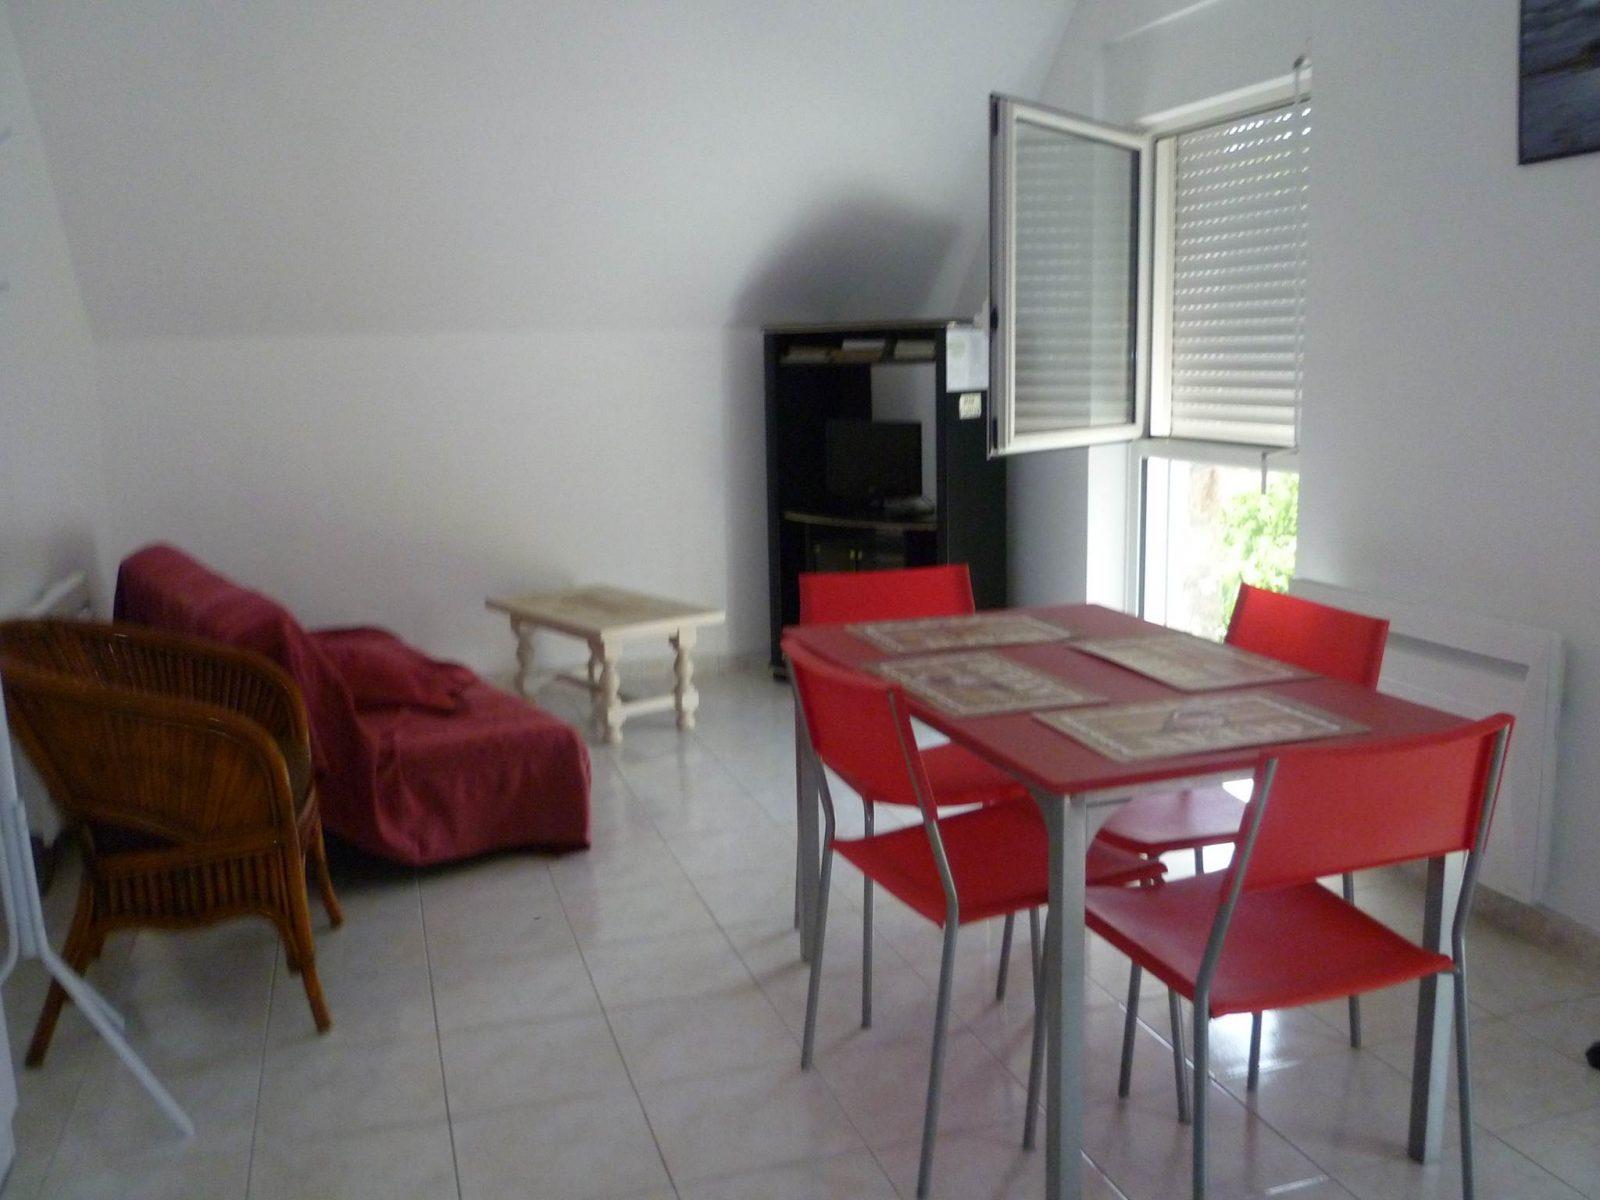 Mme RIO – Salon – Nivillac – Damgan La Roche-Bernard Tourisme